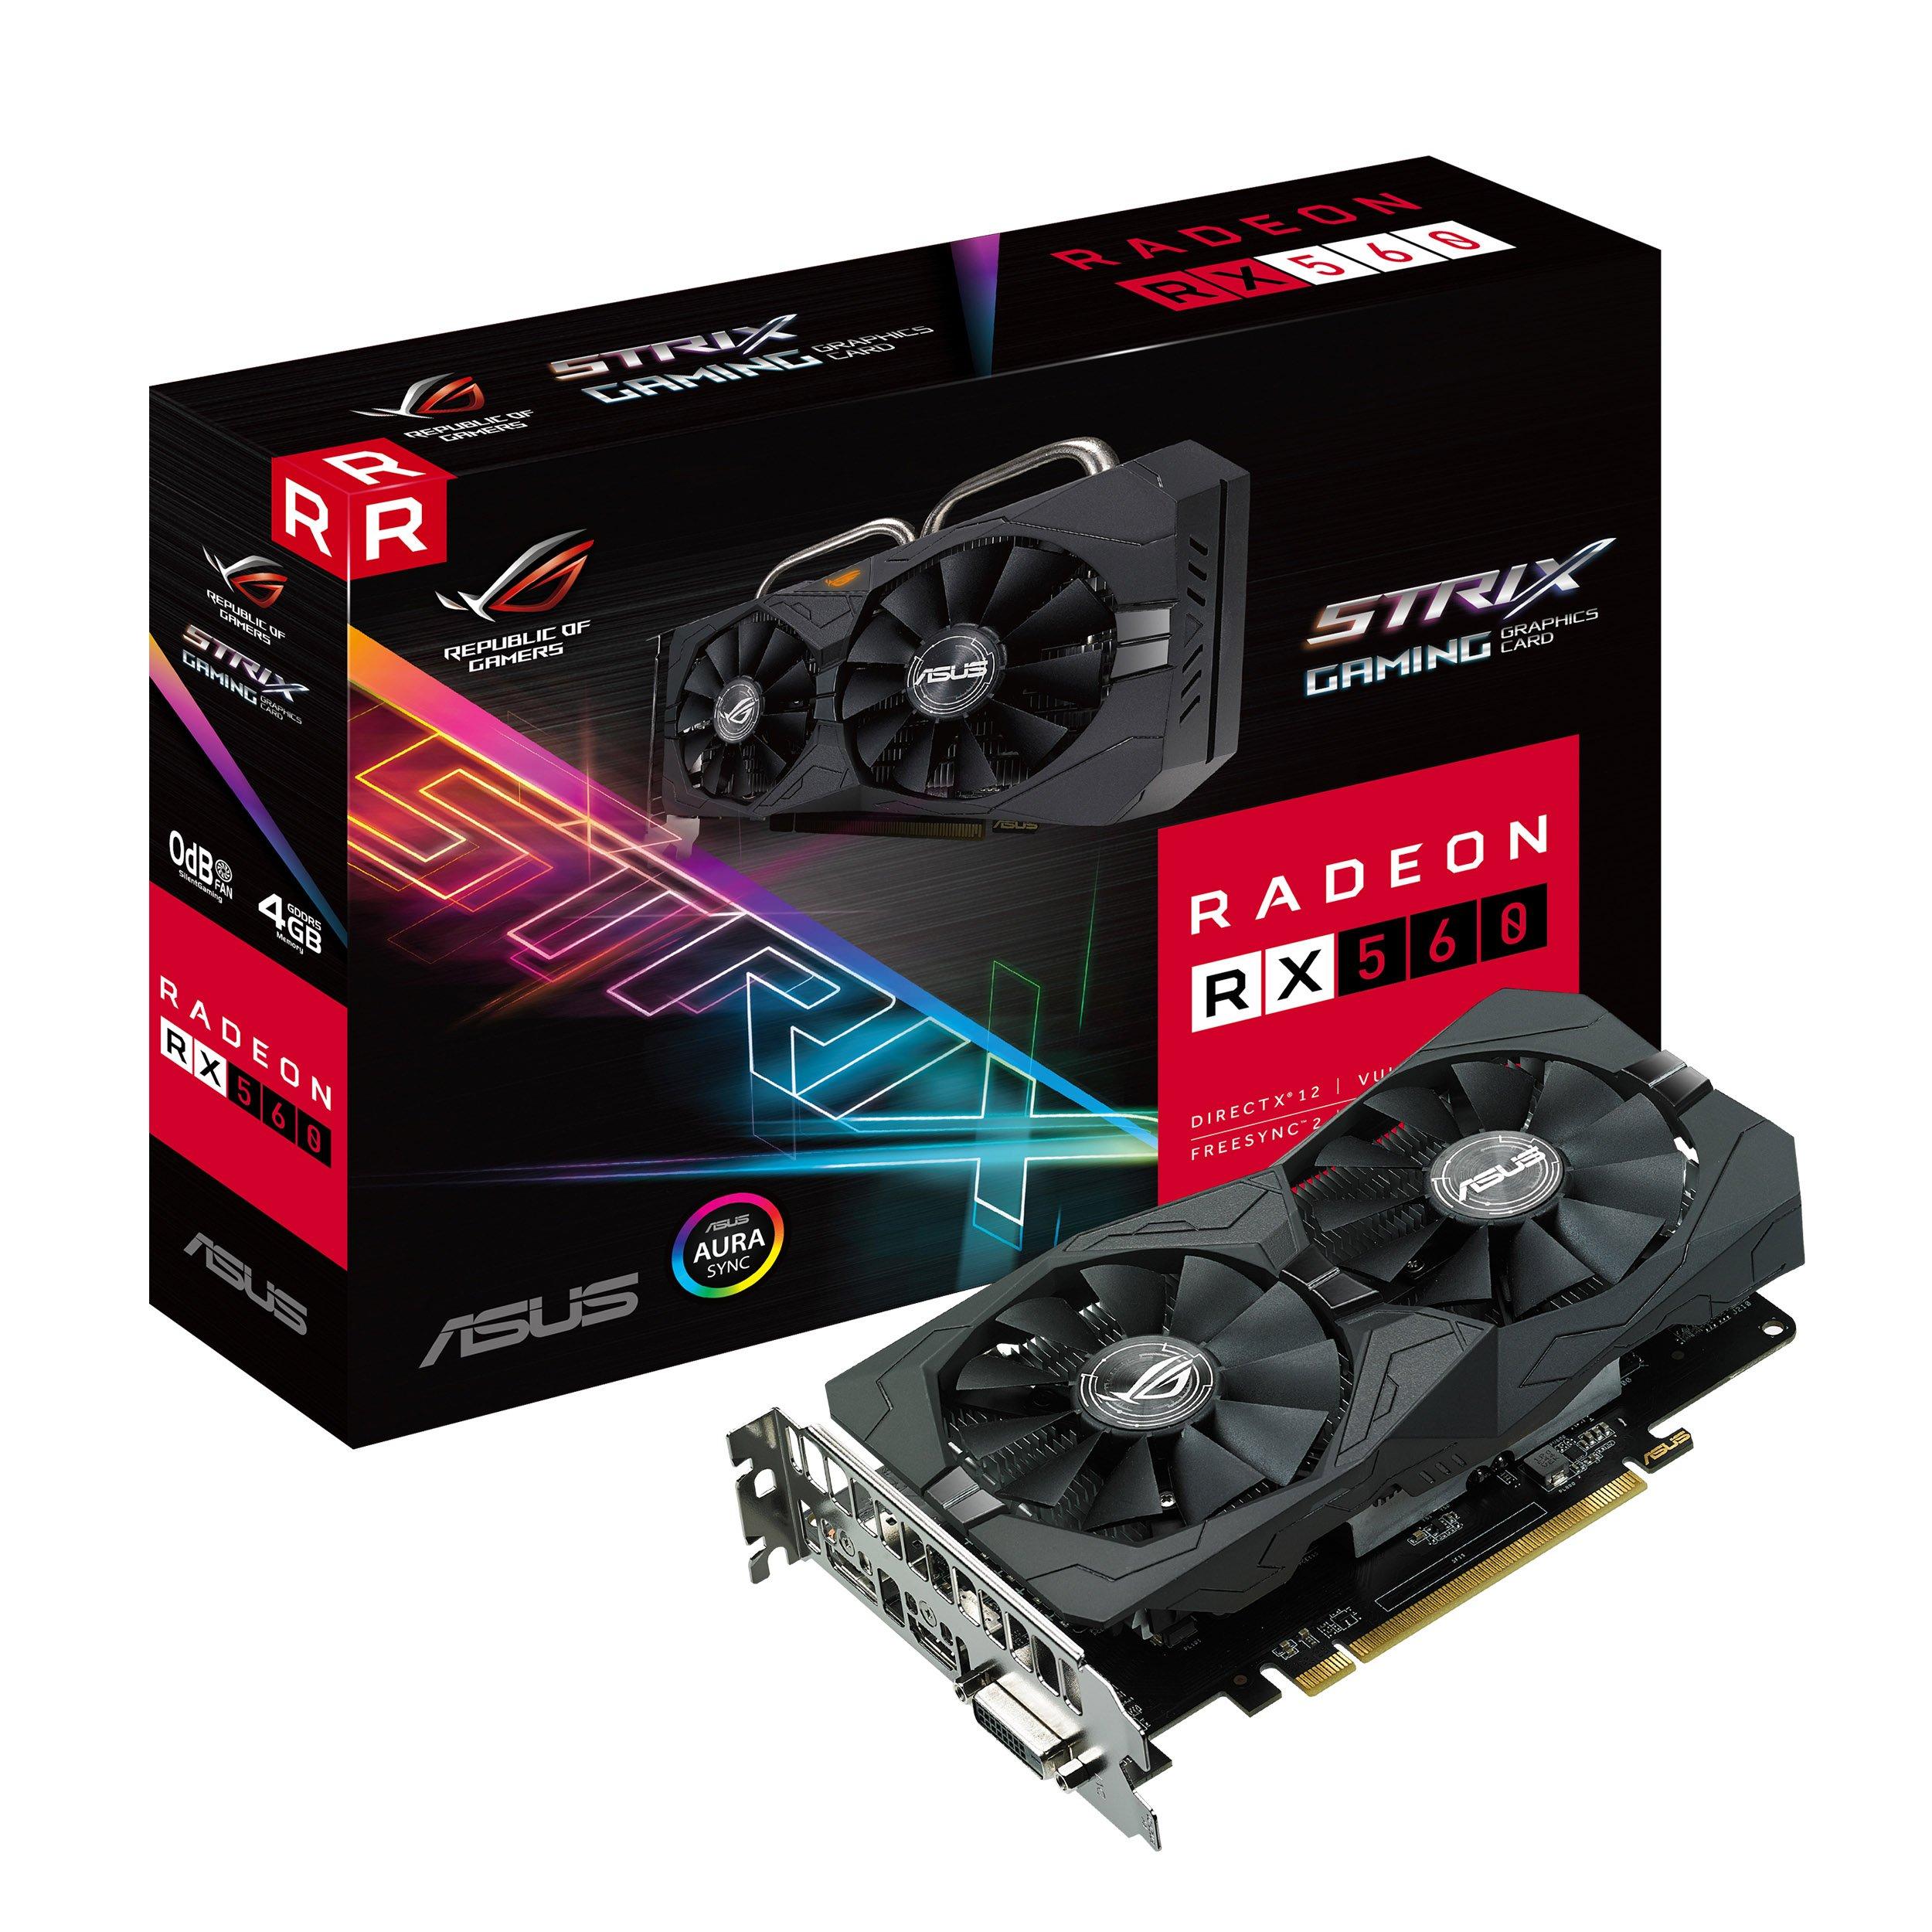 ASUS ROG Strix Radeon RX 560 16CU 4GB Gaming GDDR5 DP HDMI DVI AMD Graphics Card (ROG-STRIX-RX560-4G-GAMING)